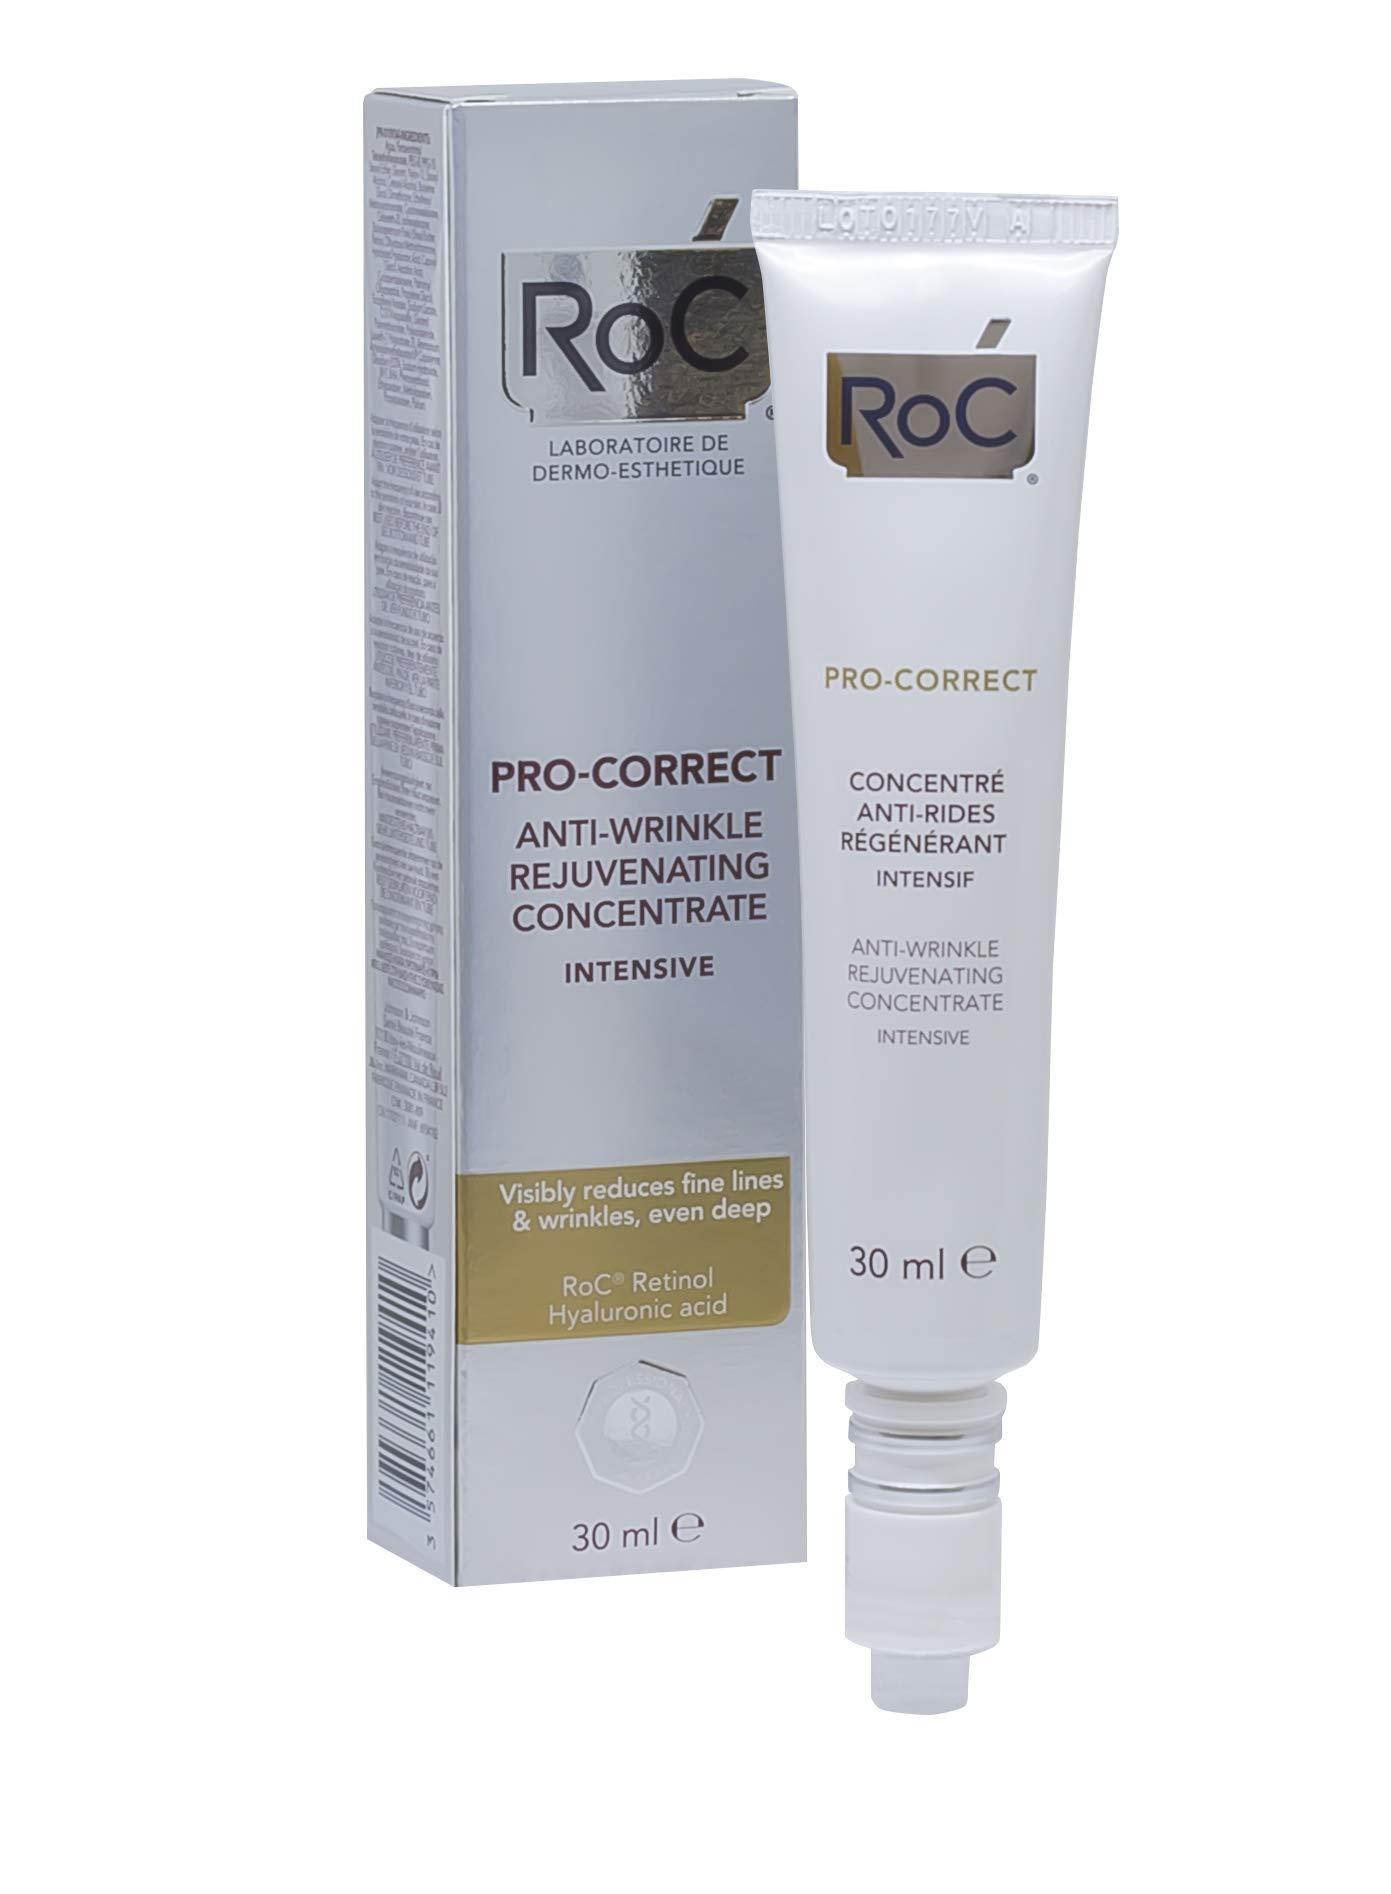 ROC Pro Correct Concentrado – Anti Arrugas Rejuvenecedor Intensivo, 30 ml